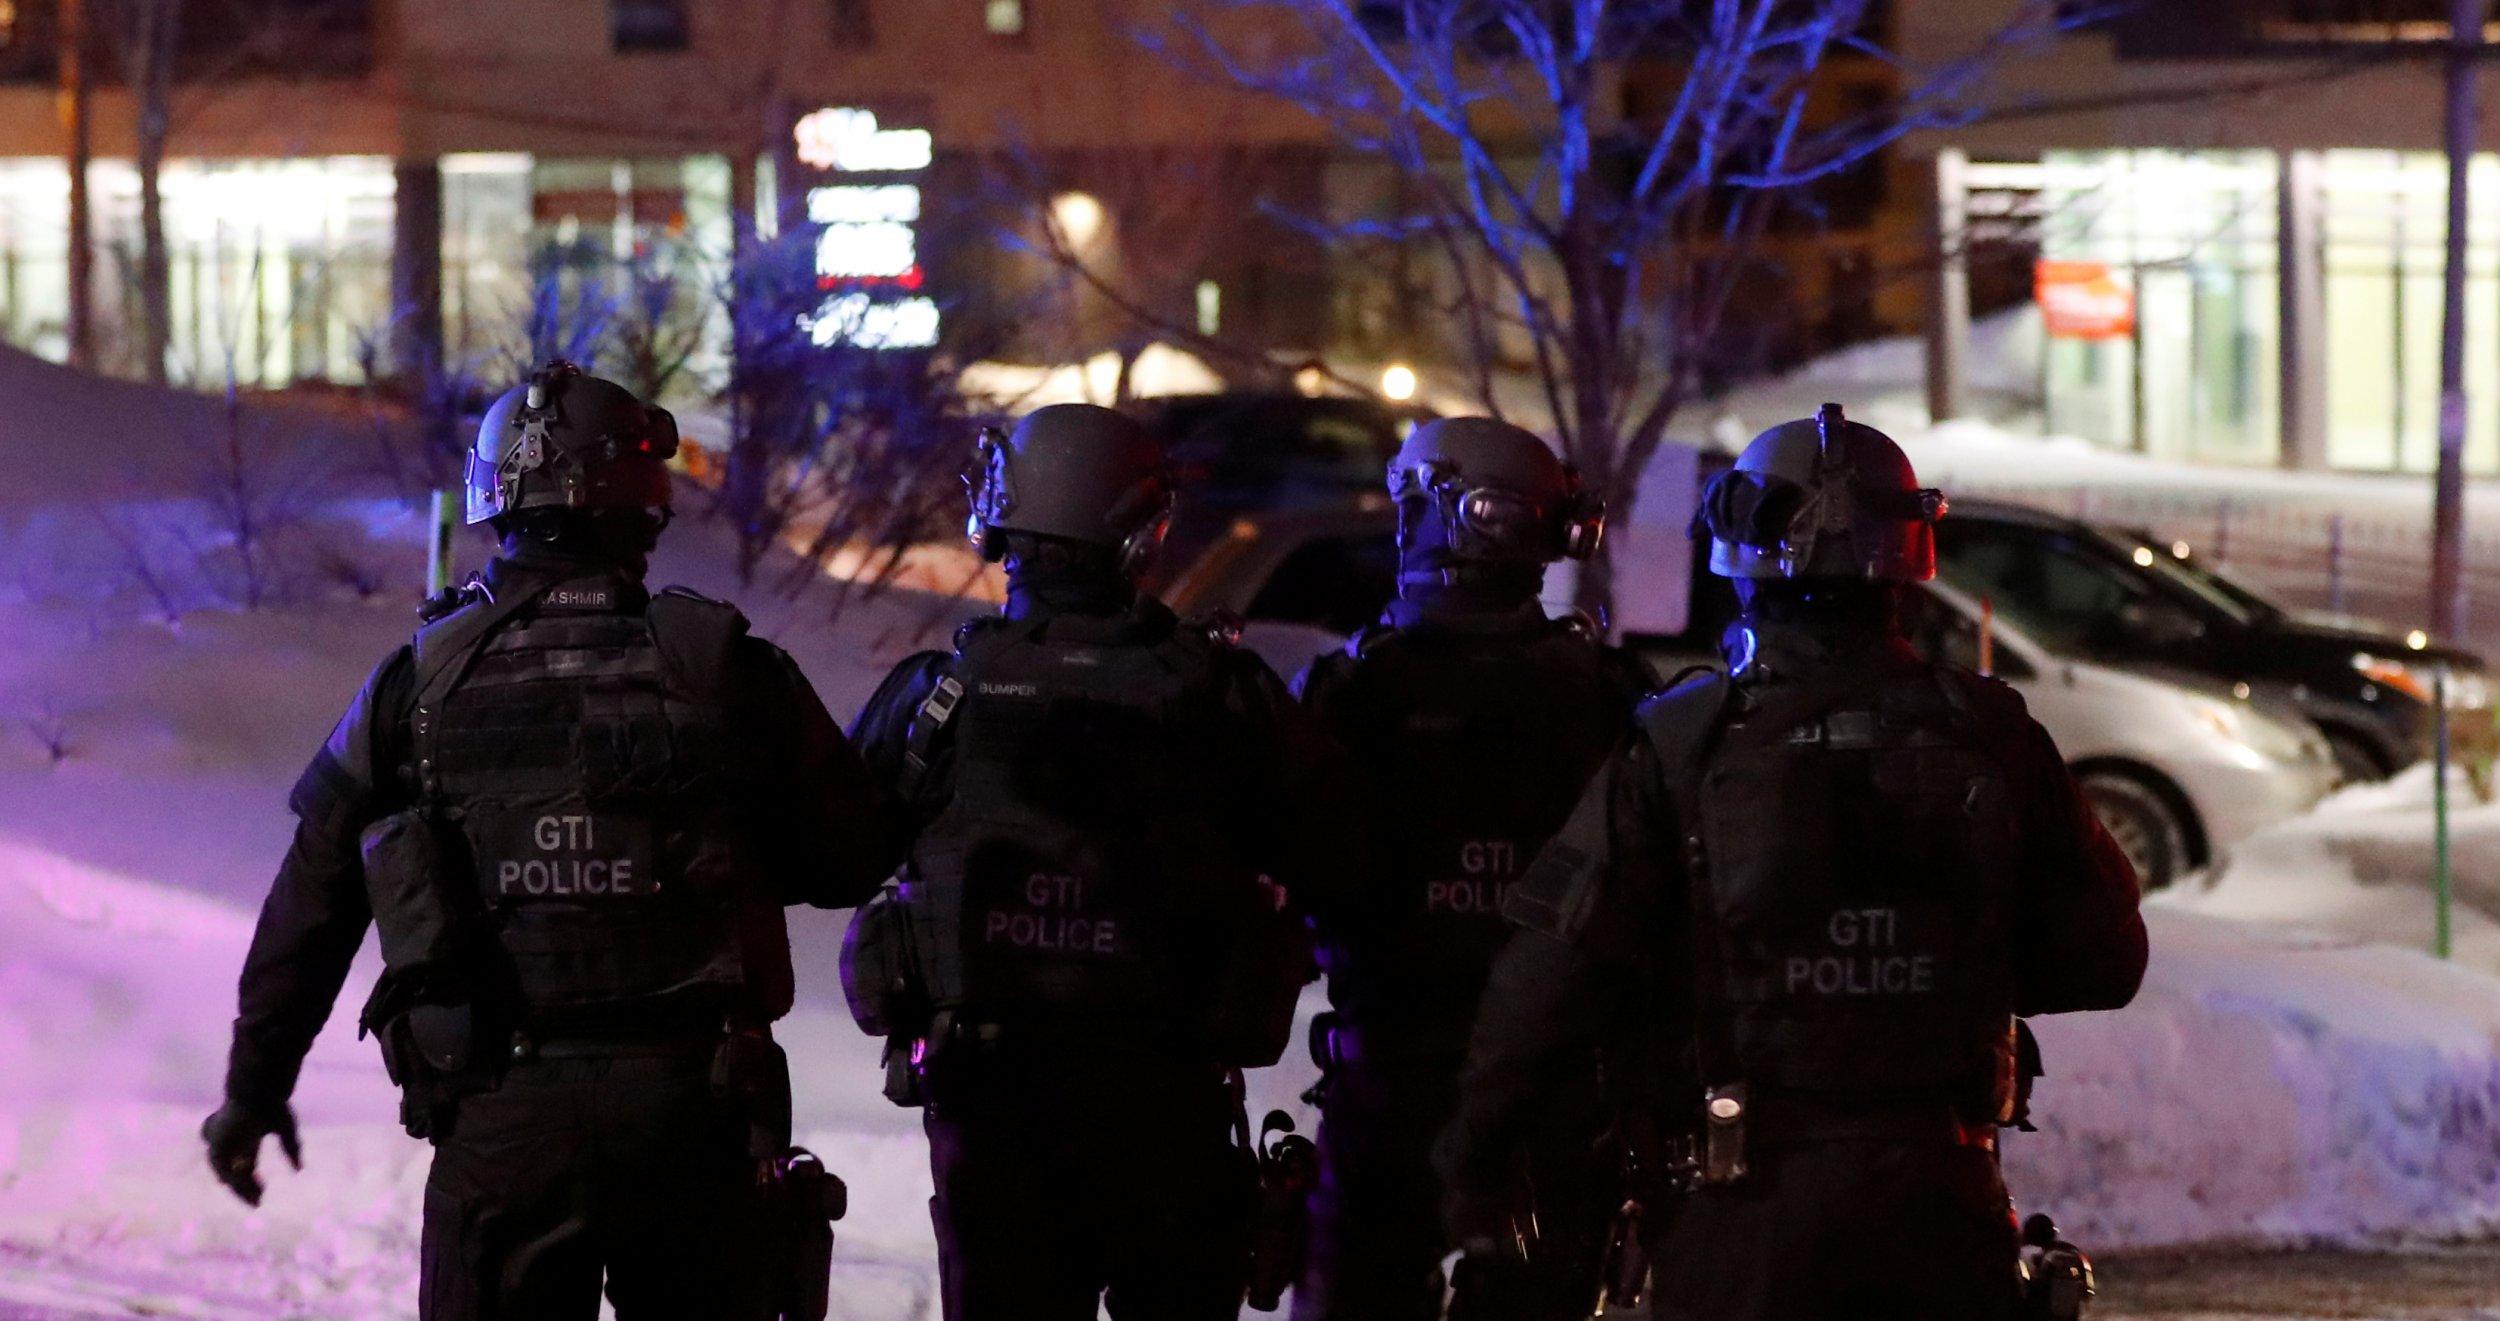 Mosque Shooting Picture: Canadian PM Justin Trudeau Calls Quebec City Mosque